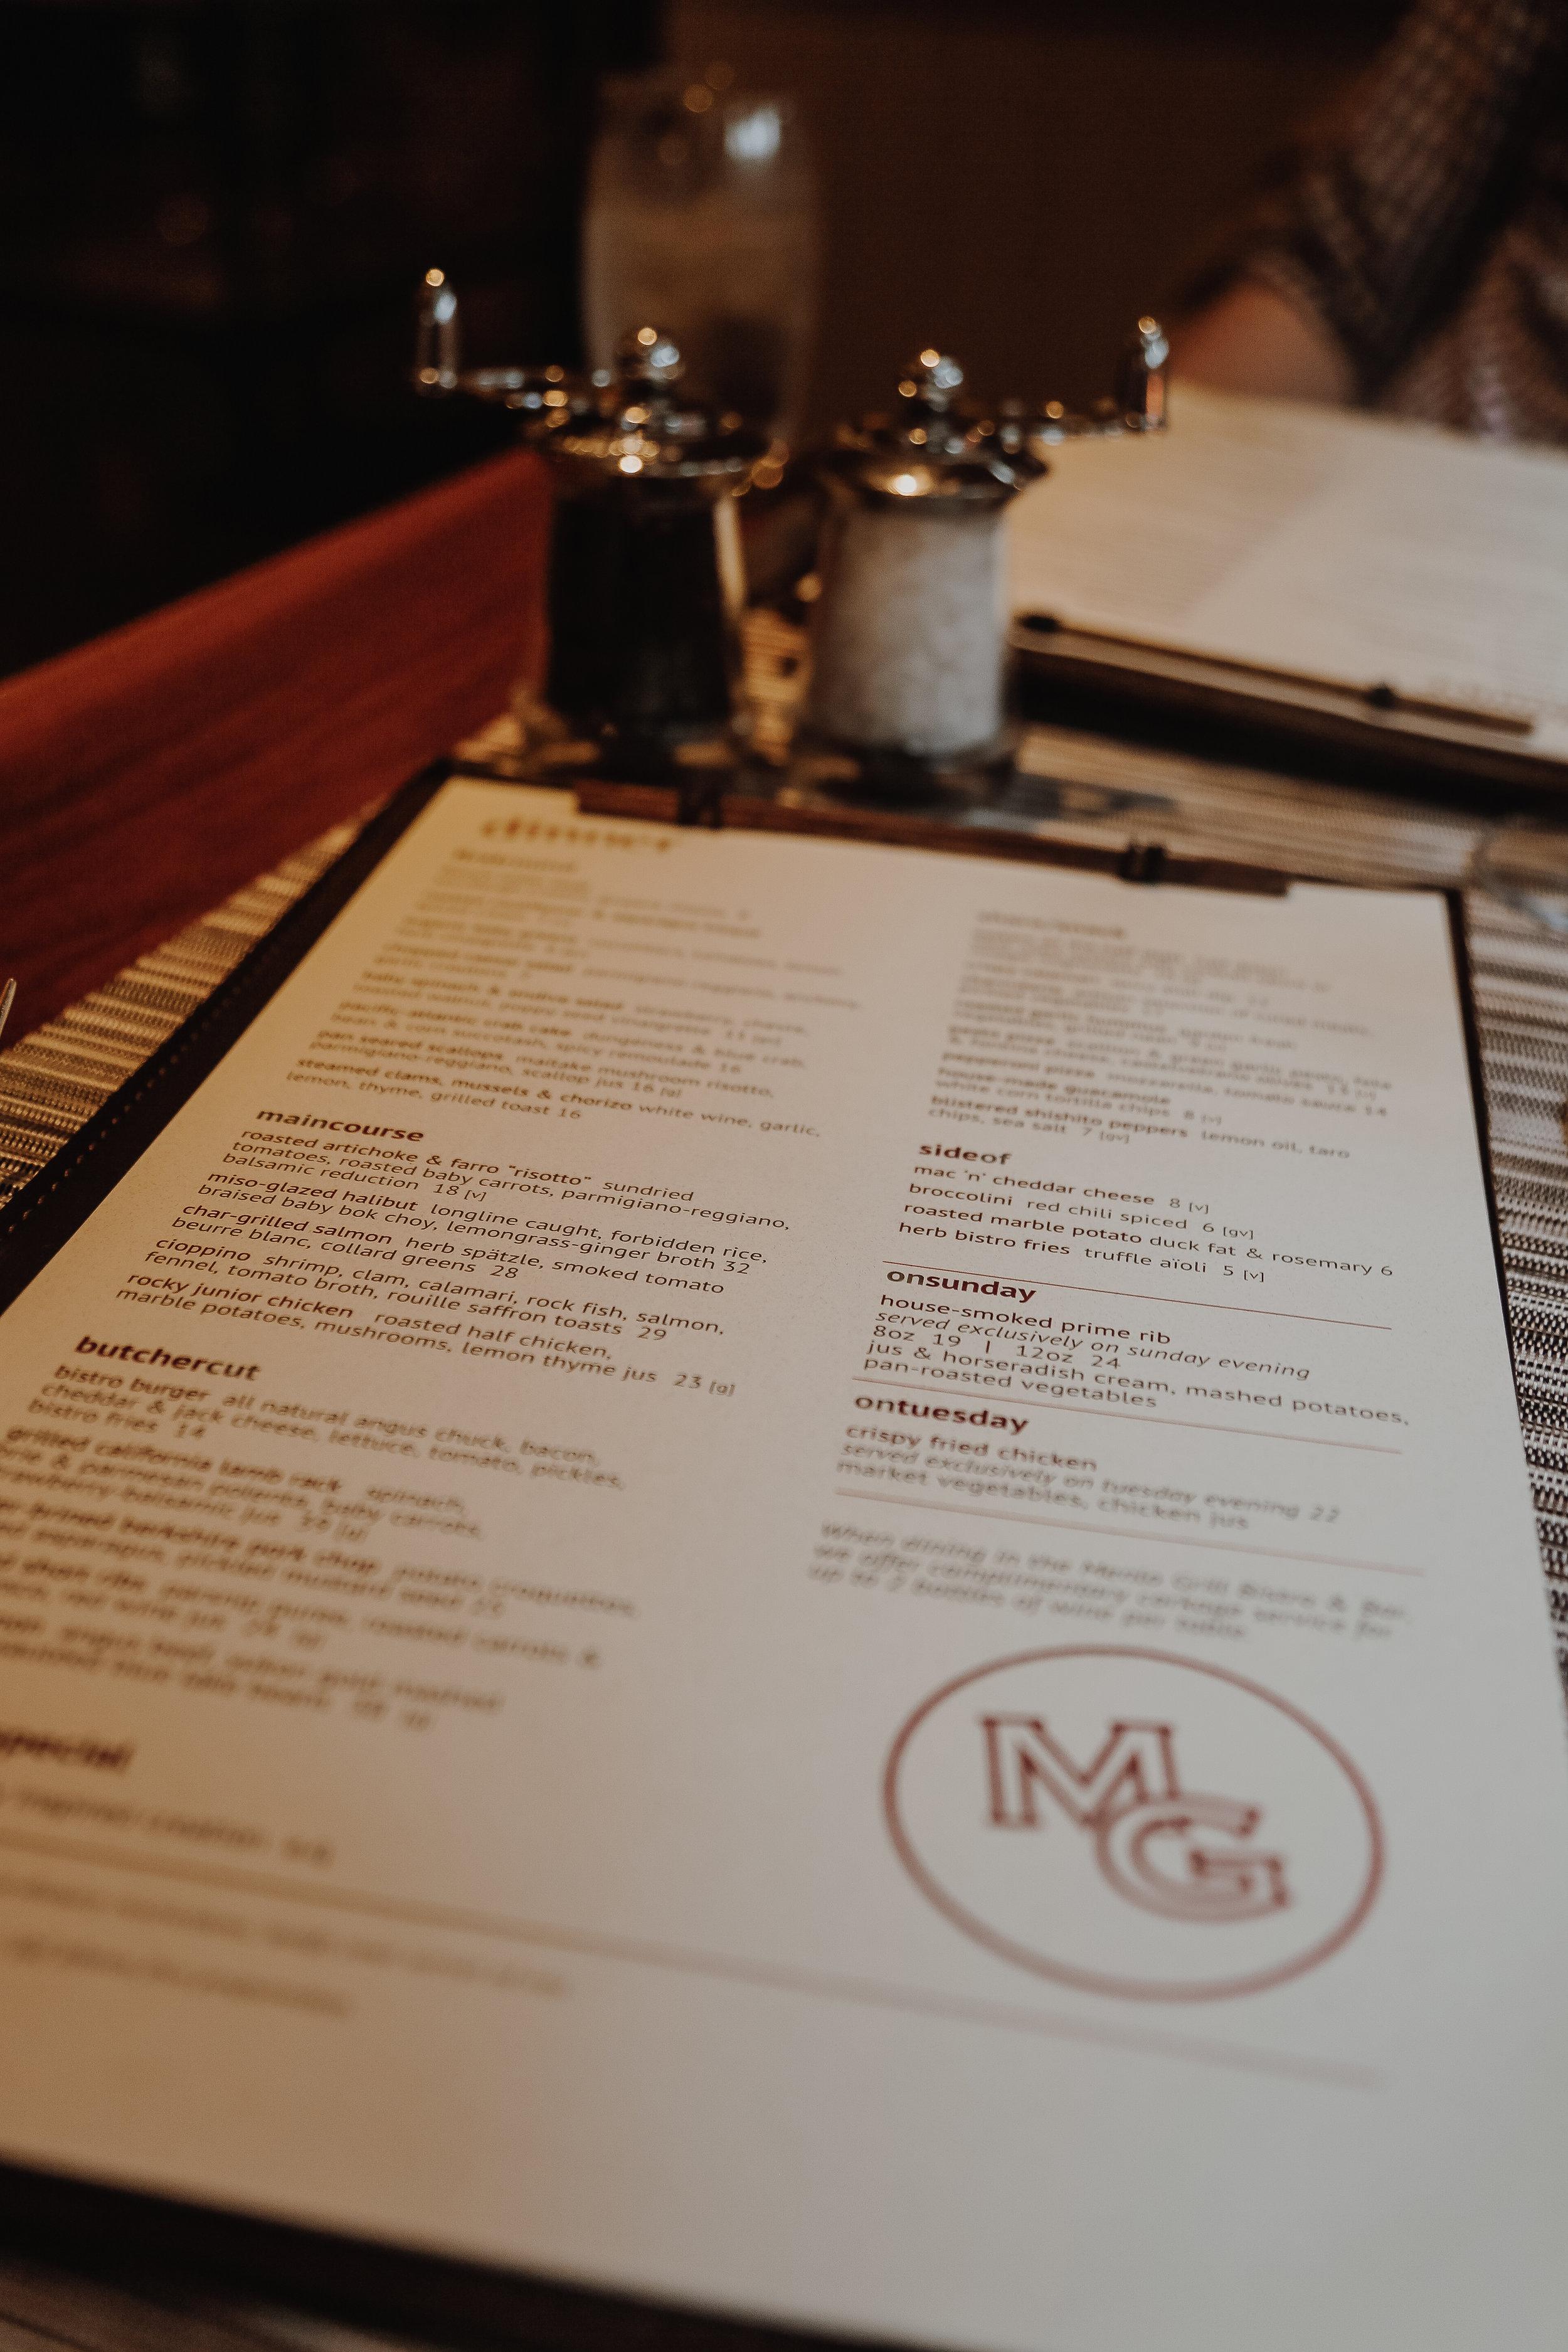 Dinner menu items range from $14-$39